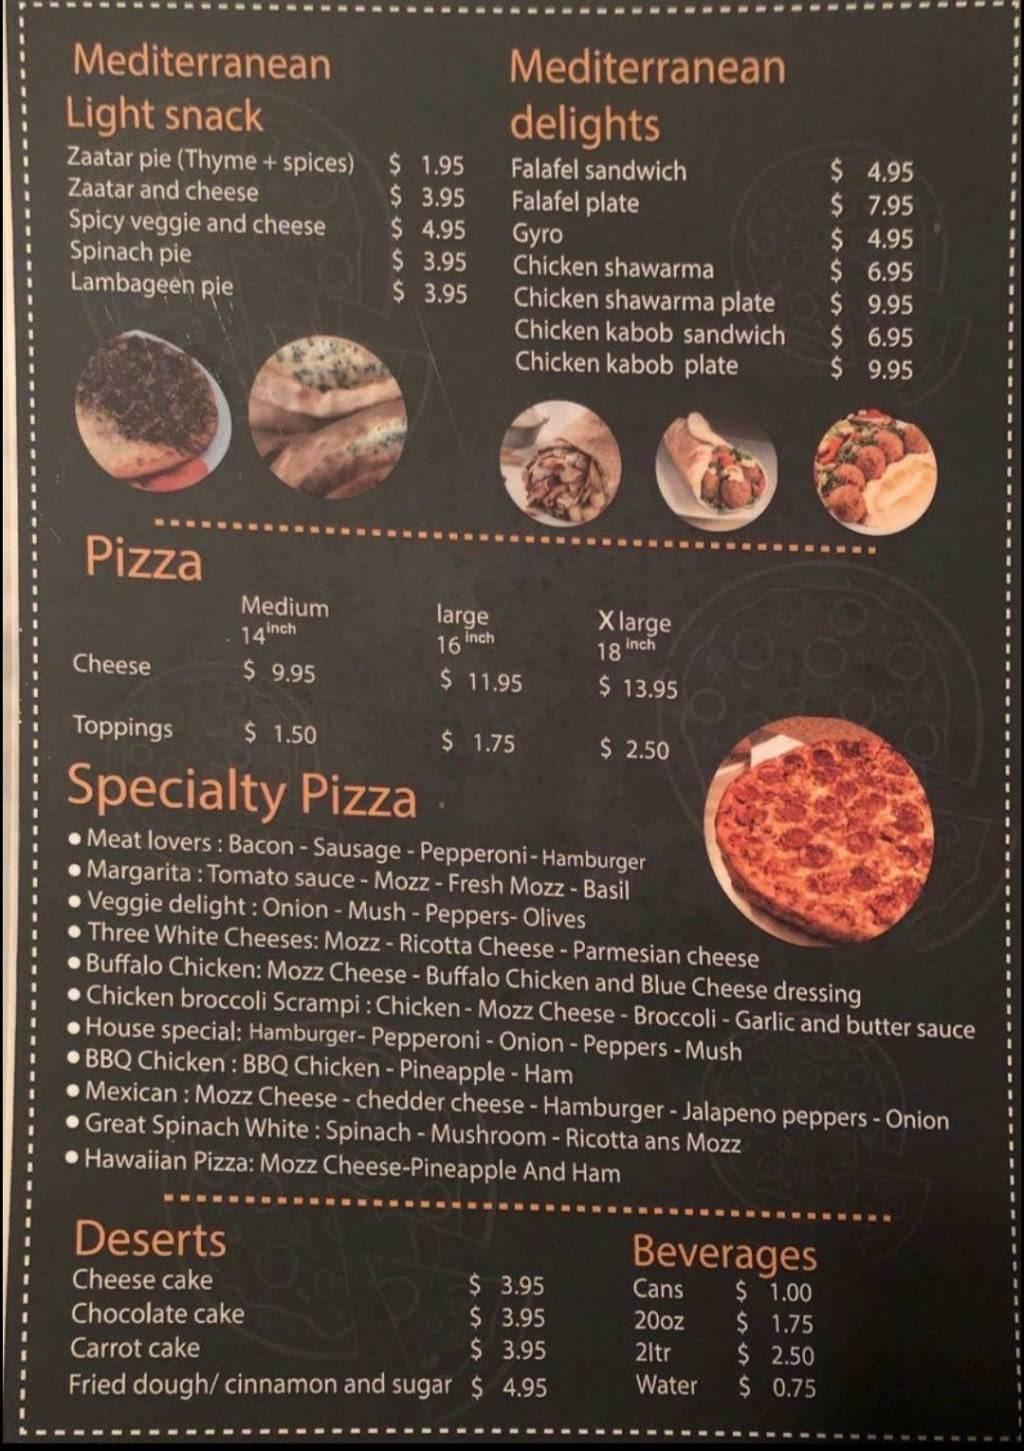 Stone Pizza | restaurant | 1899 Wilbraham Rd, Springfield, MA 01129, USA | 4134551292 OR +1 413-455-1292